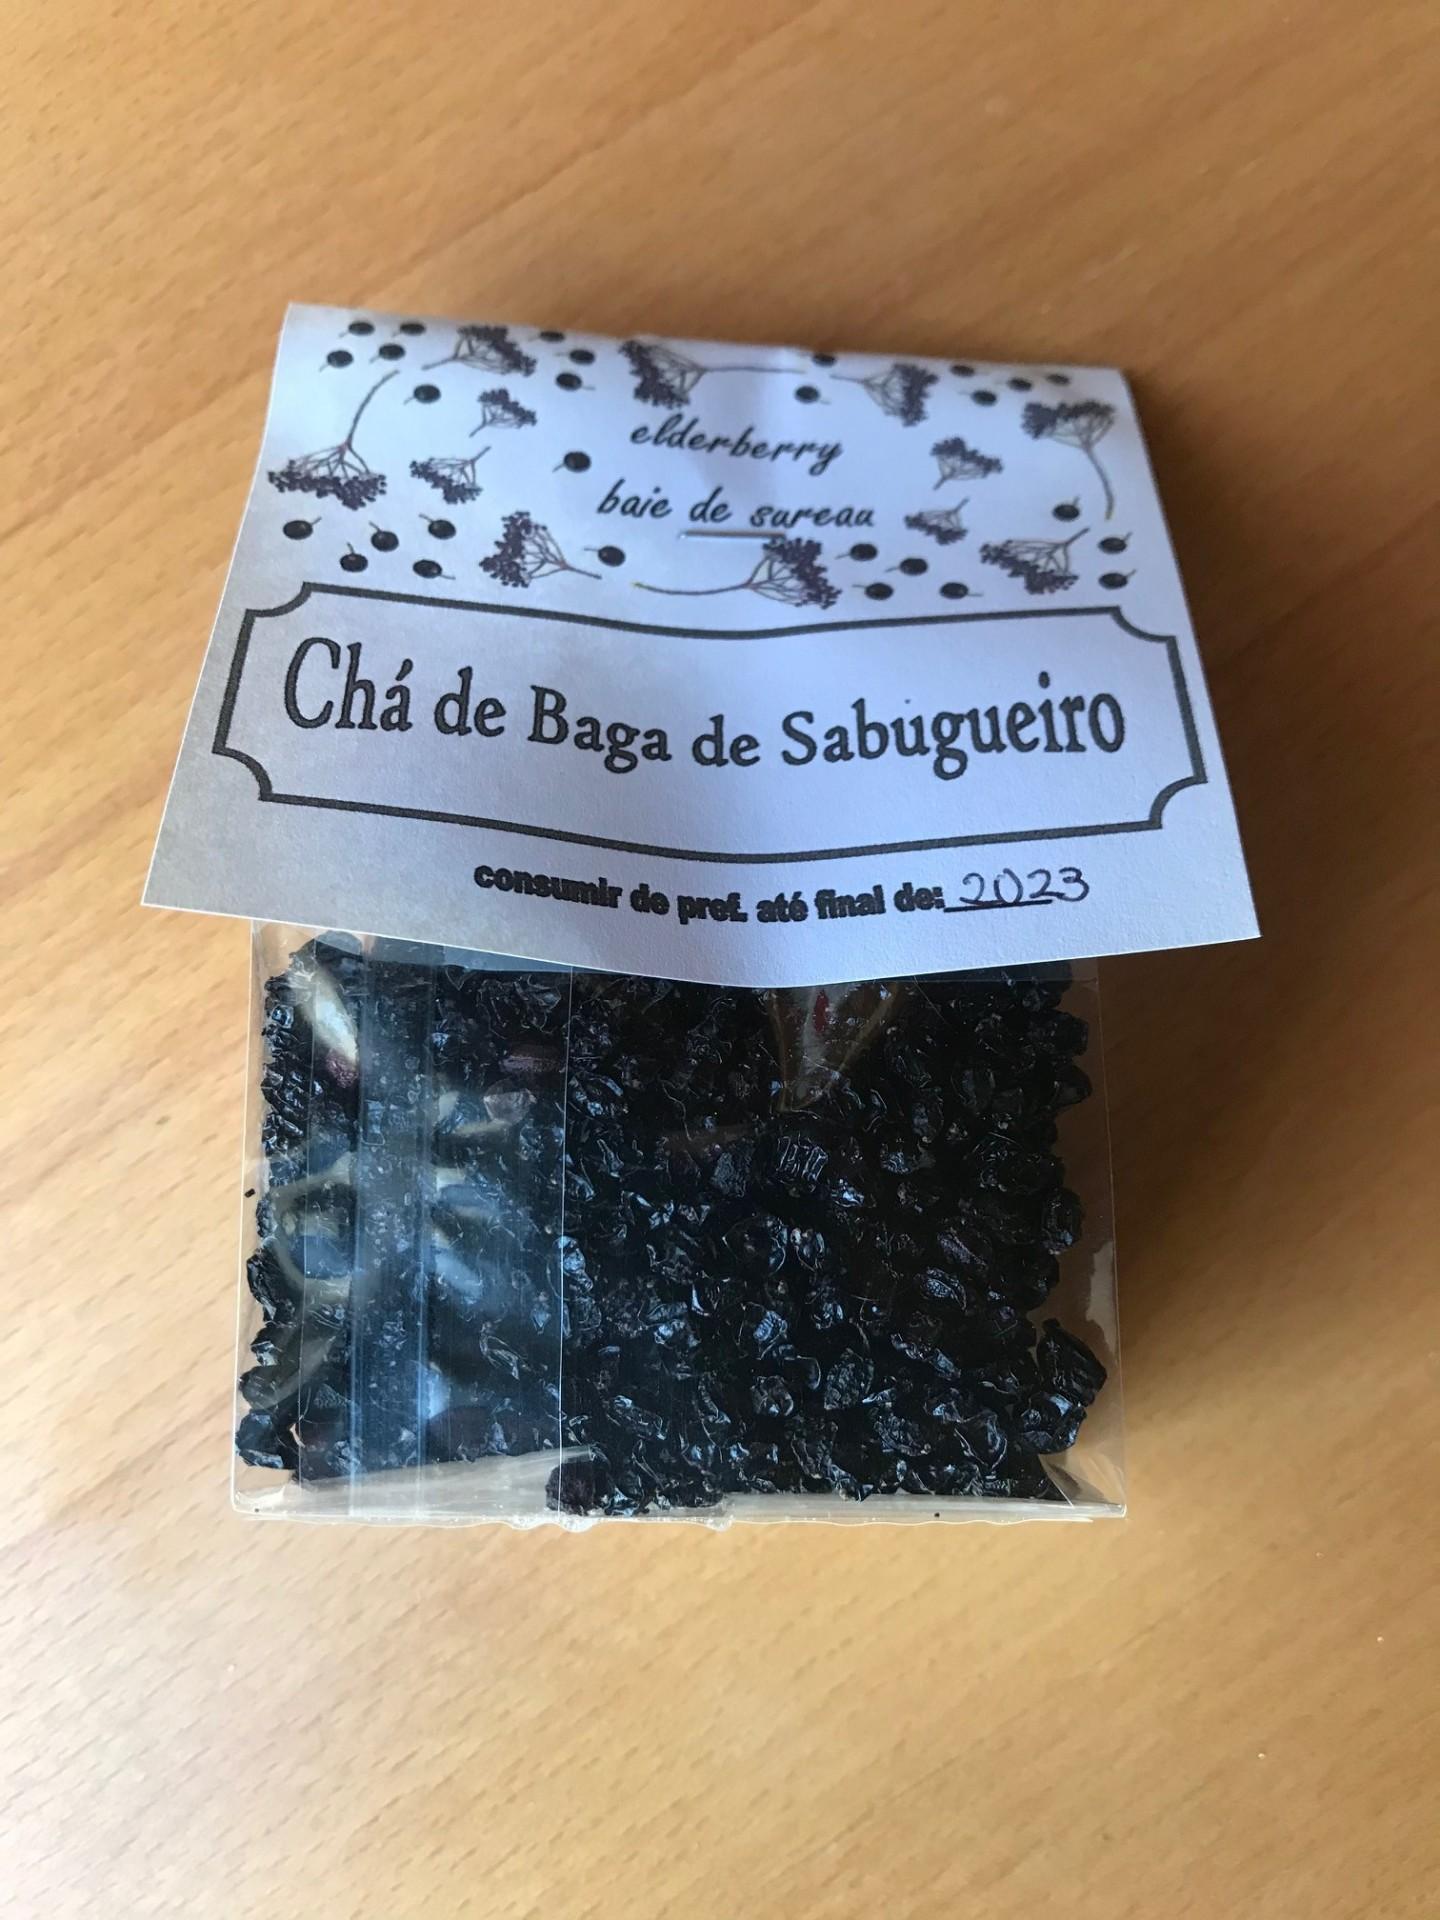 Chá de Baga de Sabugueiro